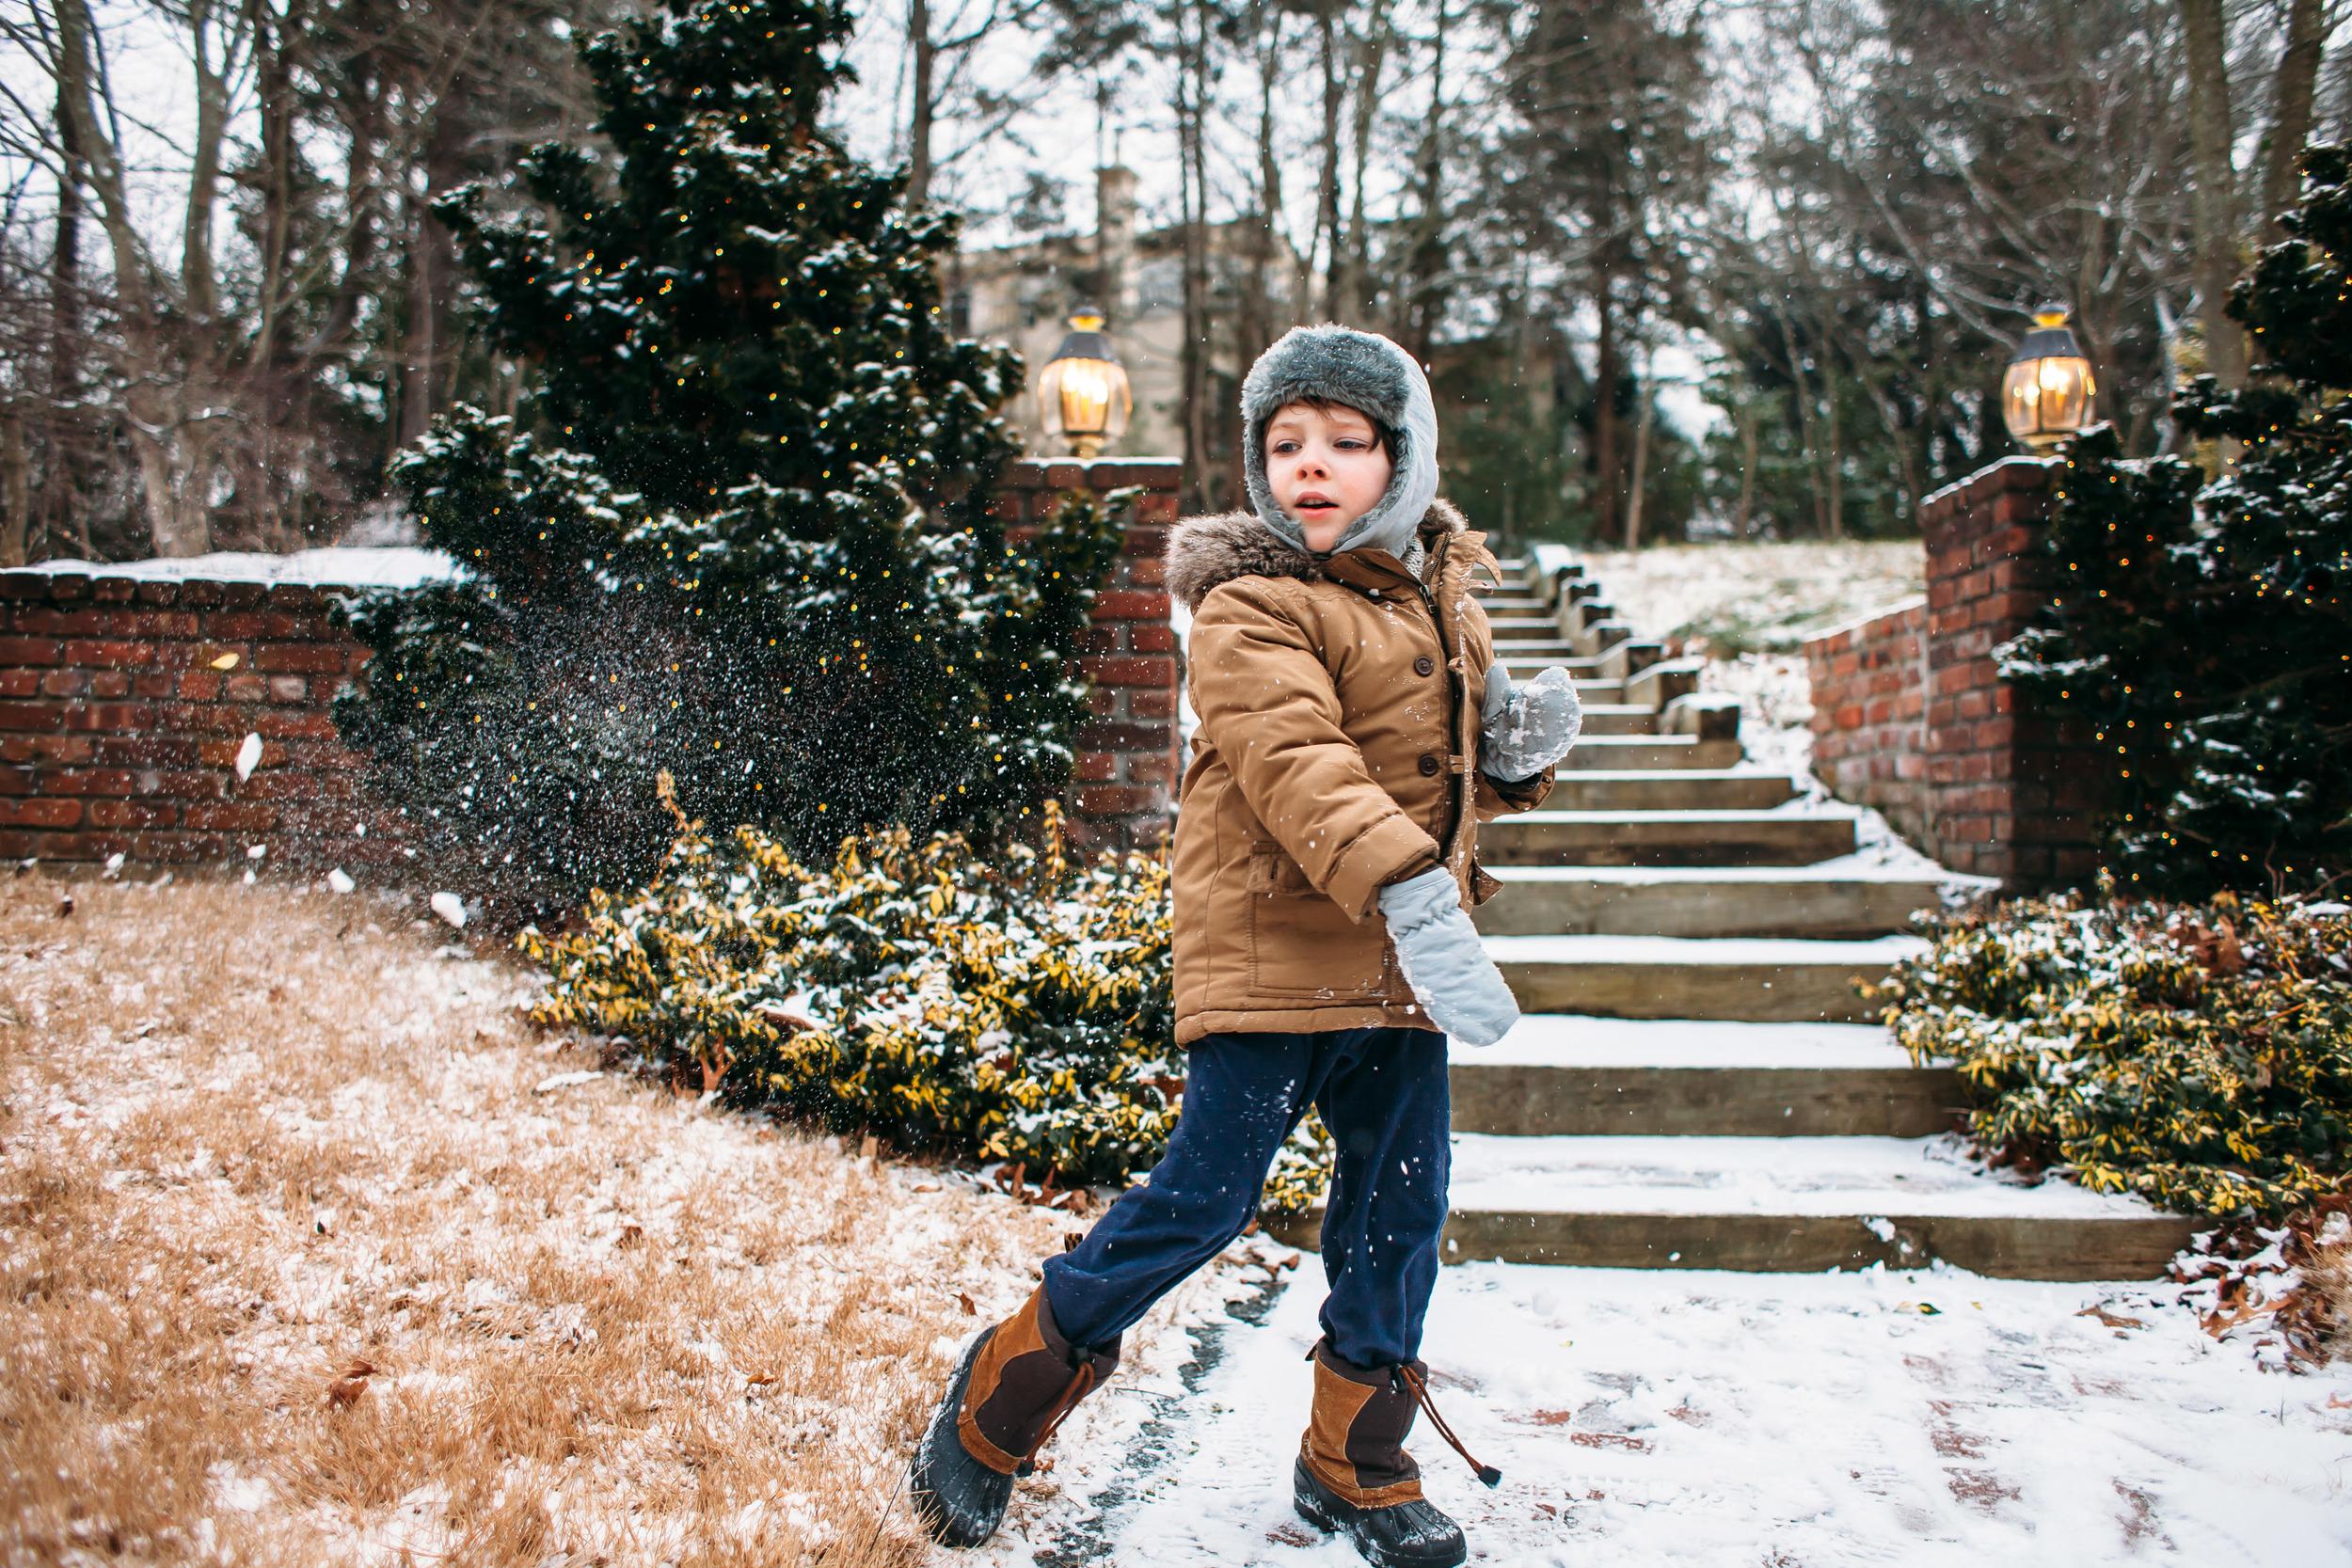 jennifer_tippett_photography_snow_2_2015